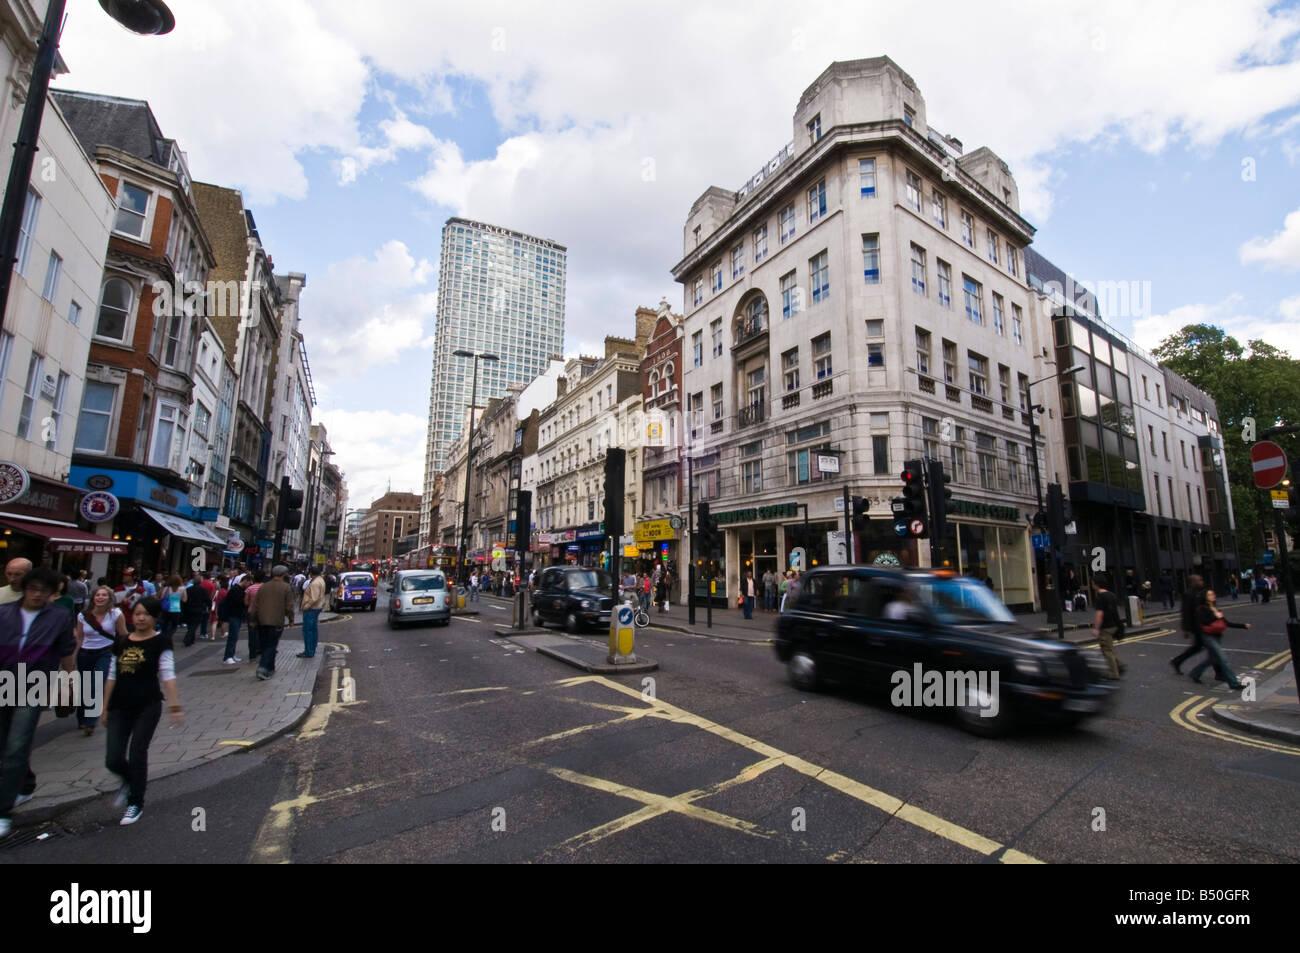 Oxford Street London England UK - Stock Image